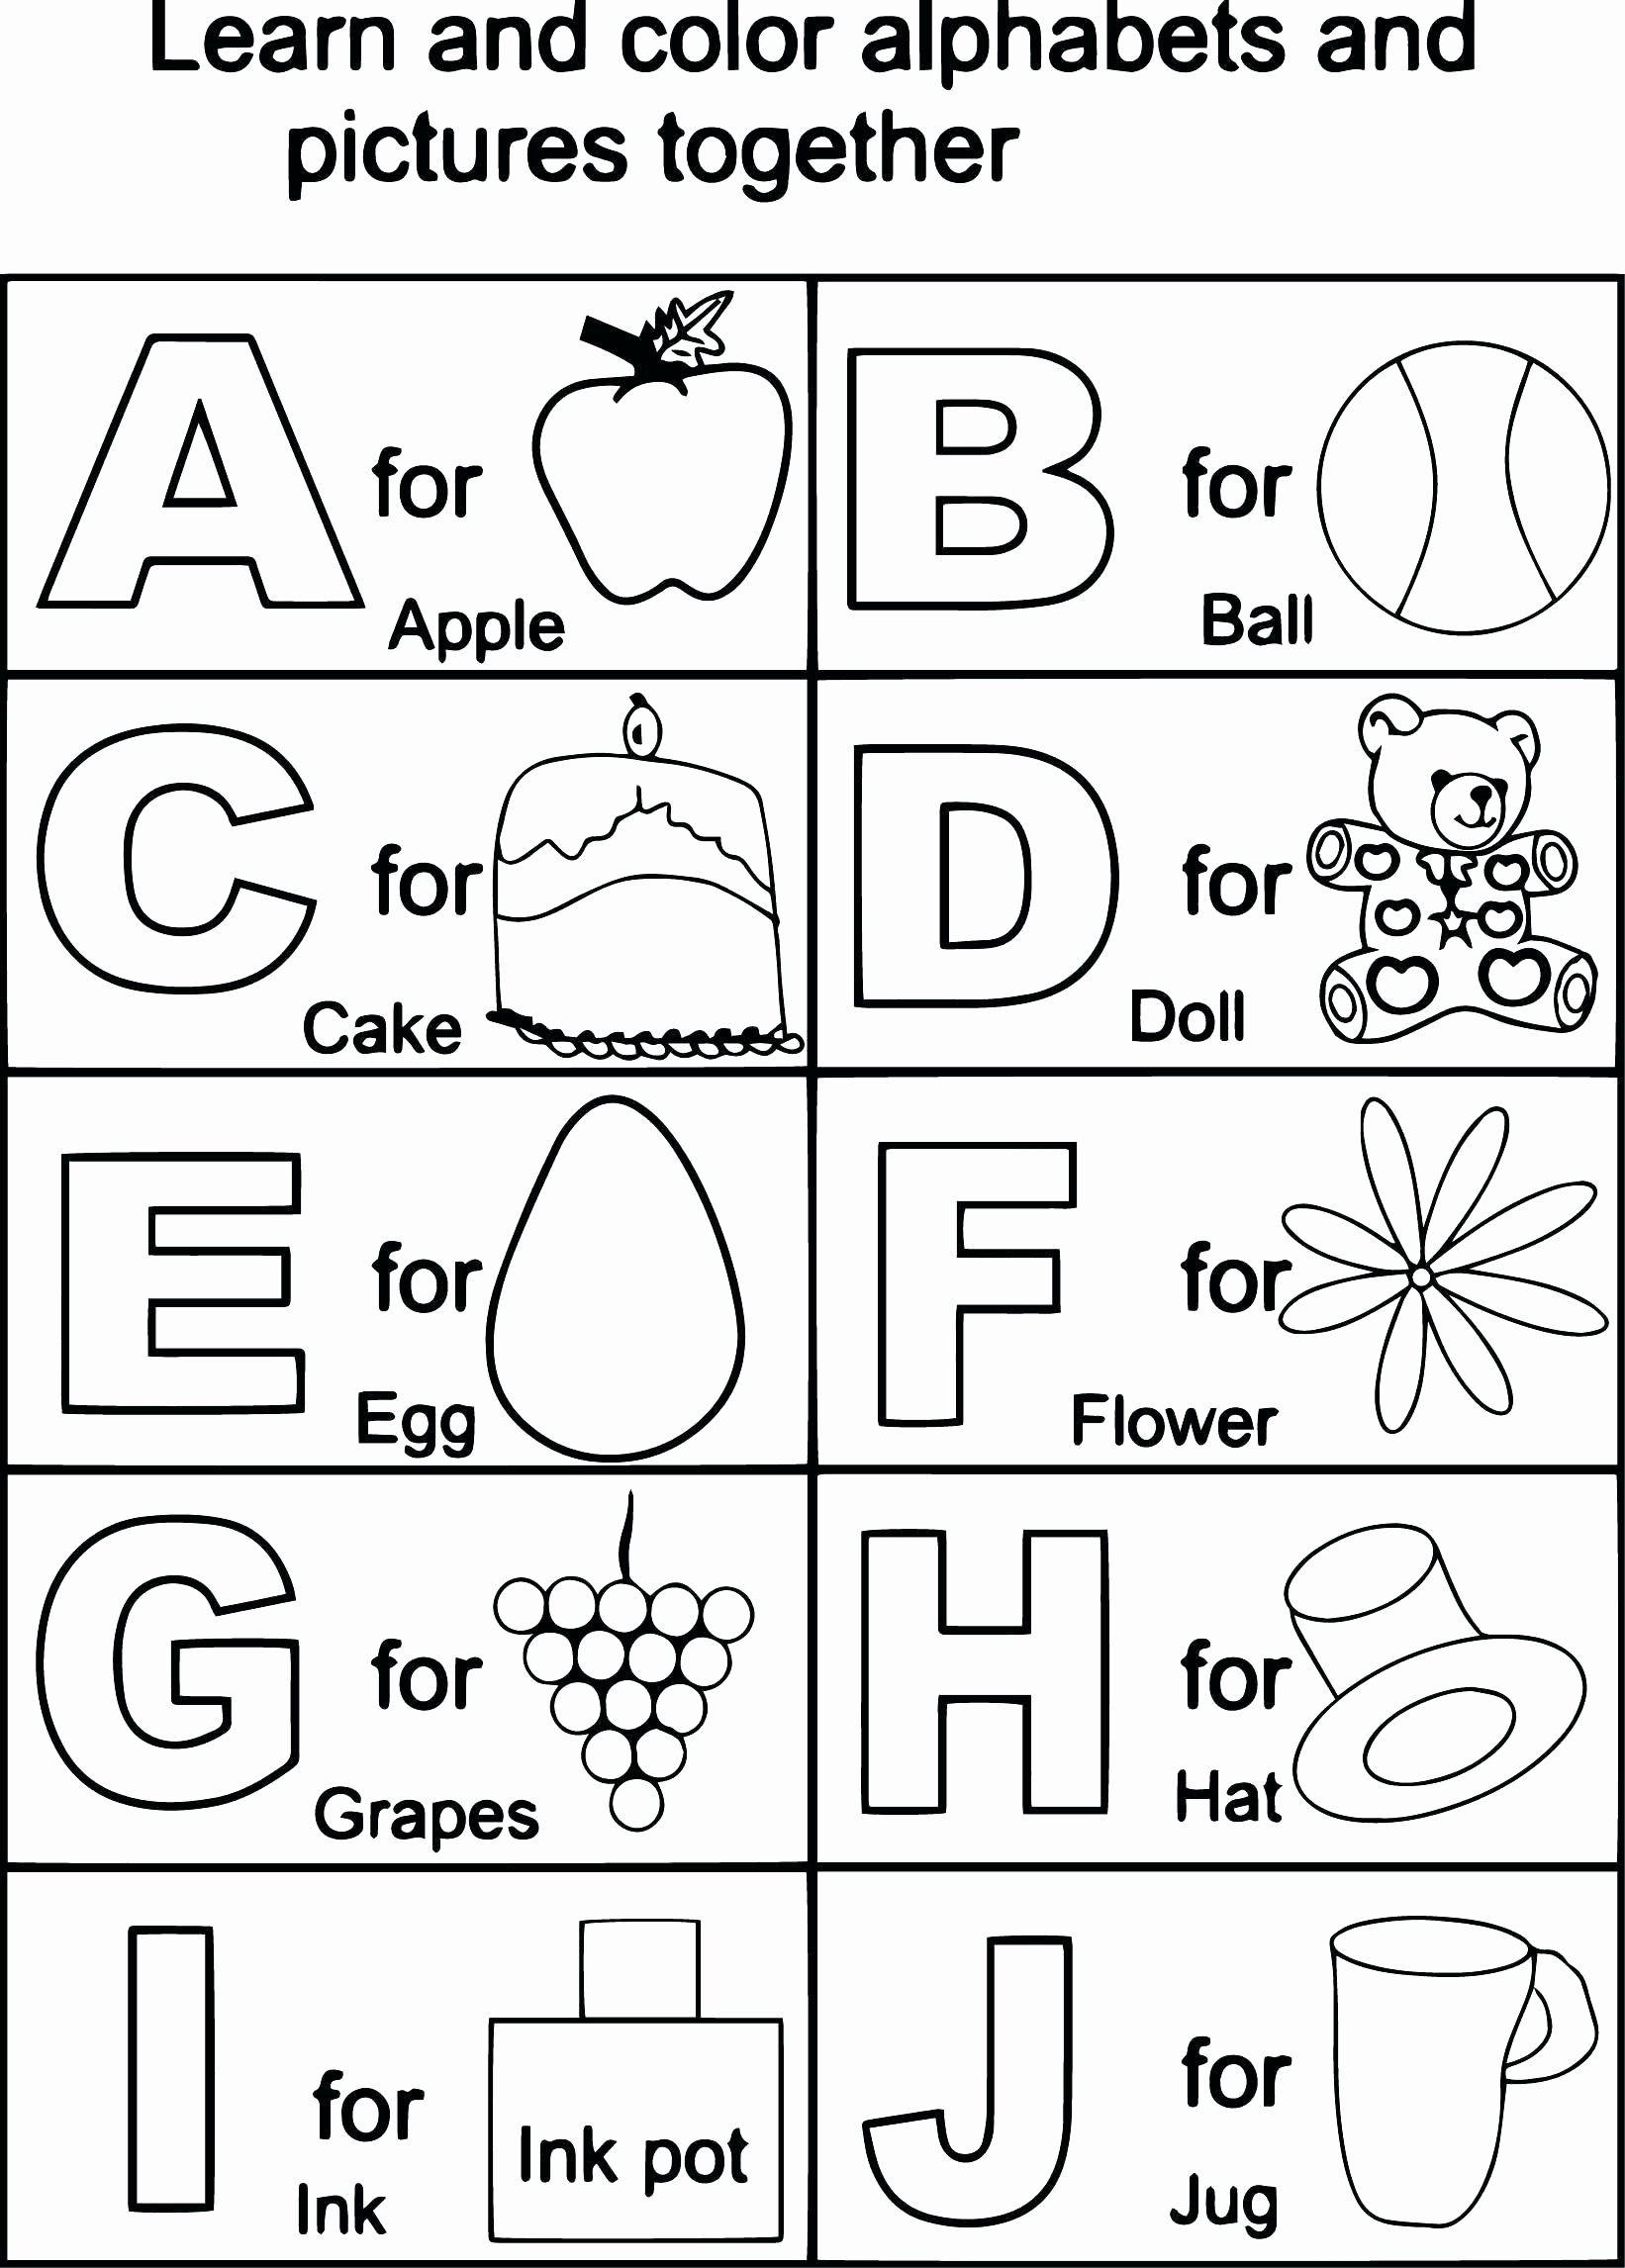 Toddler Learning Coloring Pages  Pendidikan, Gambar